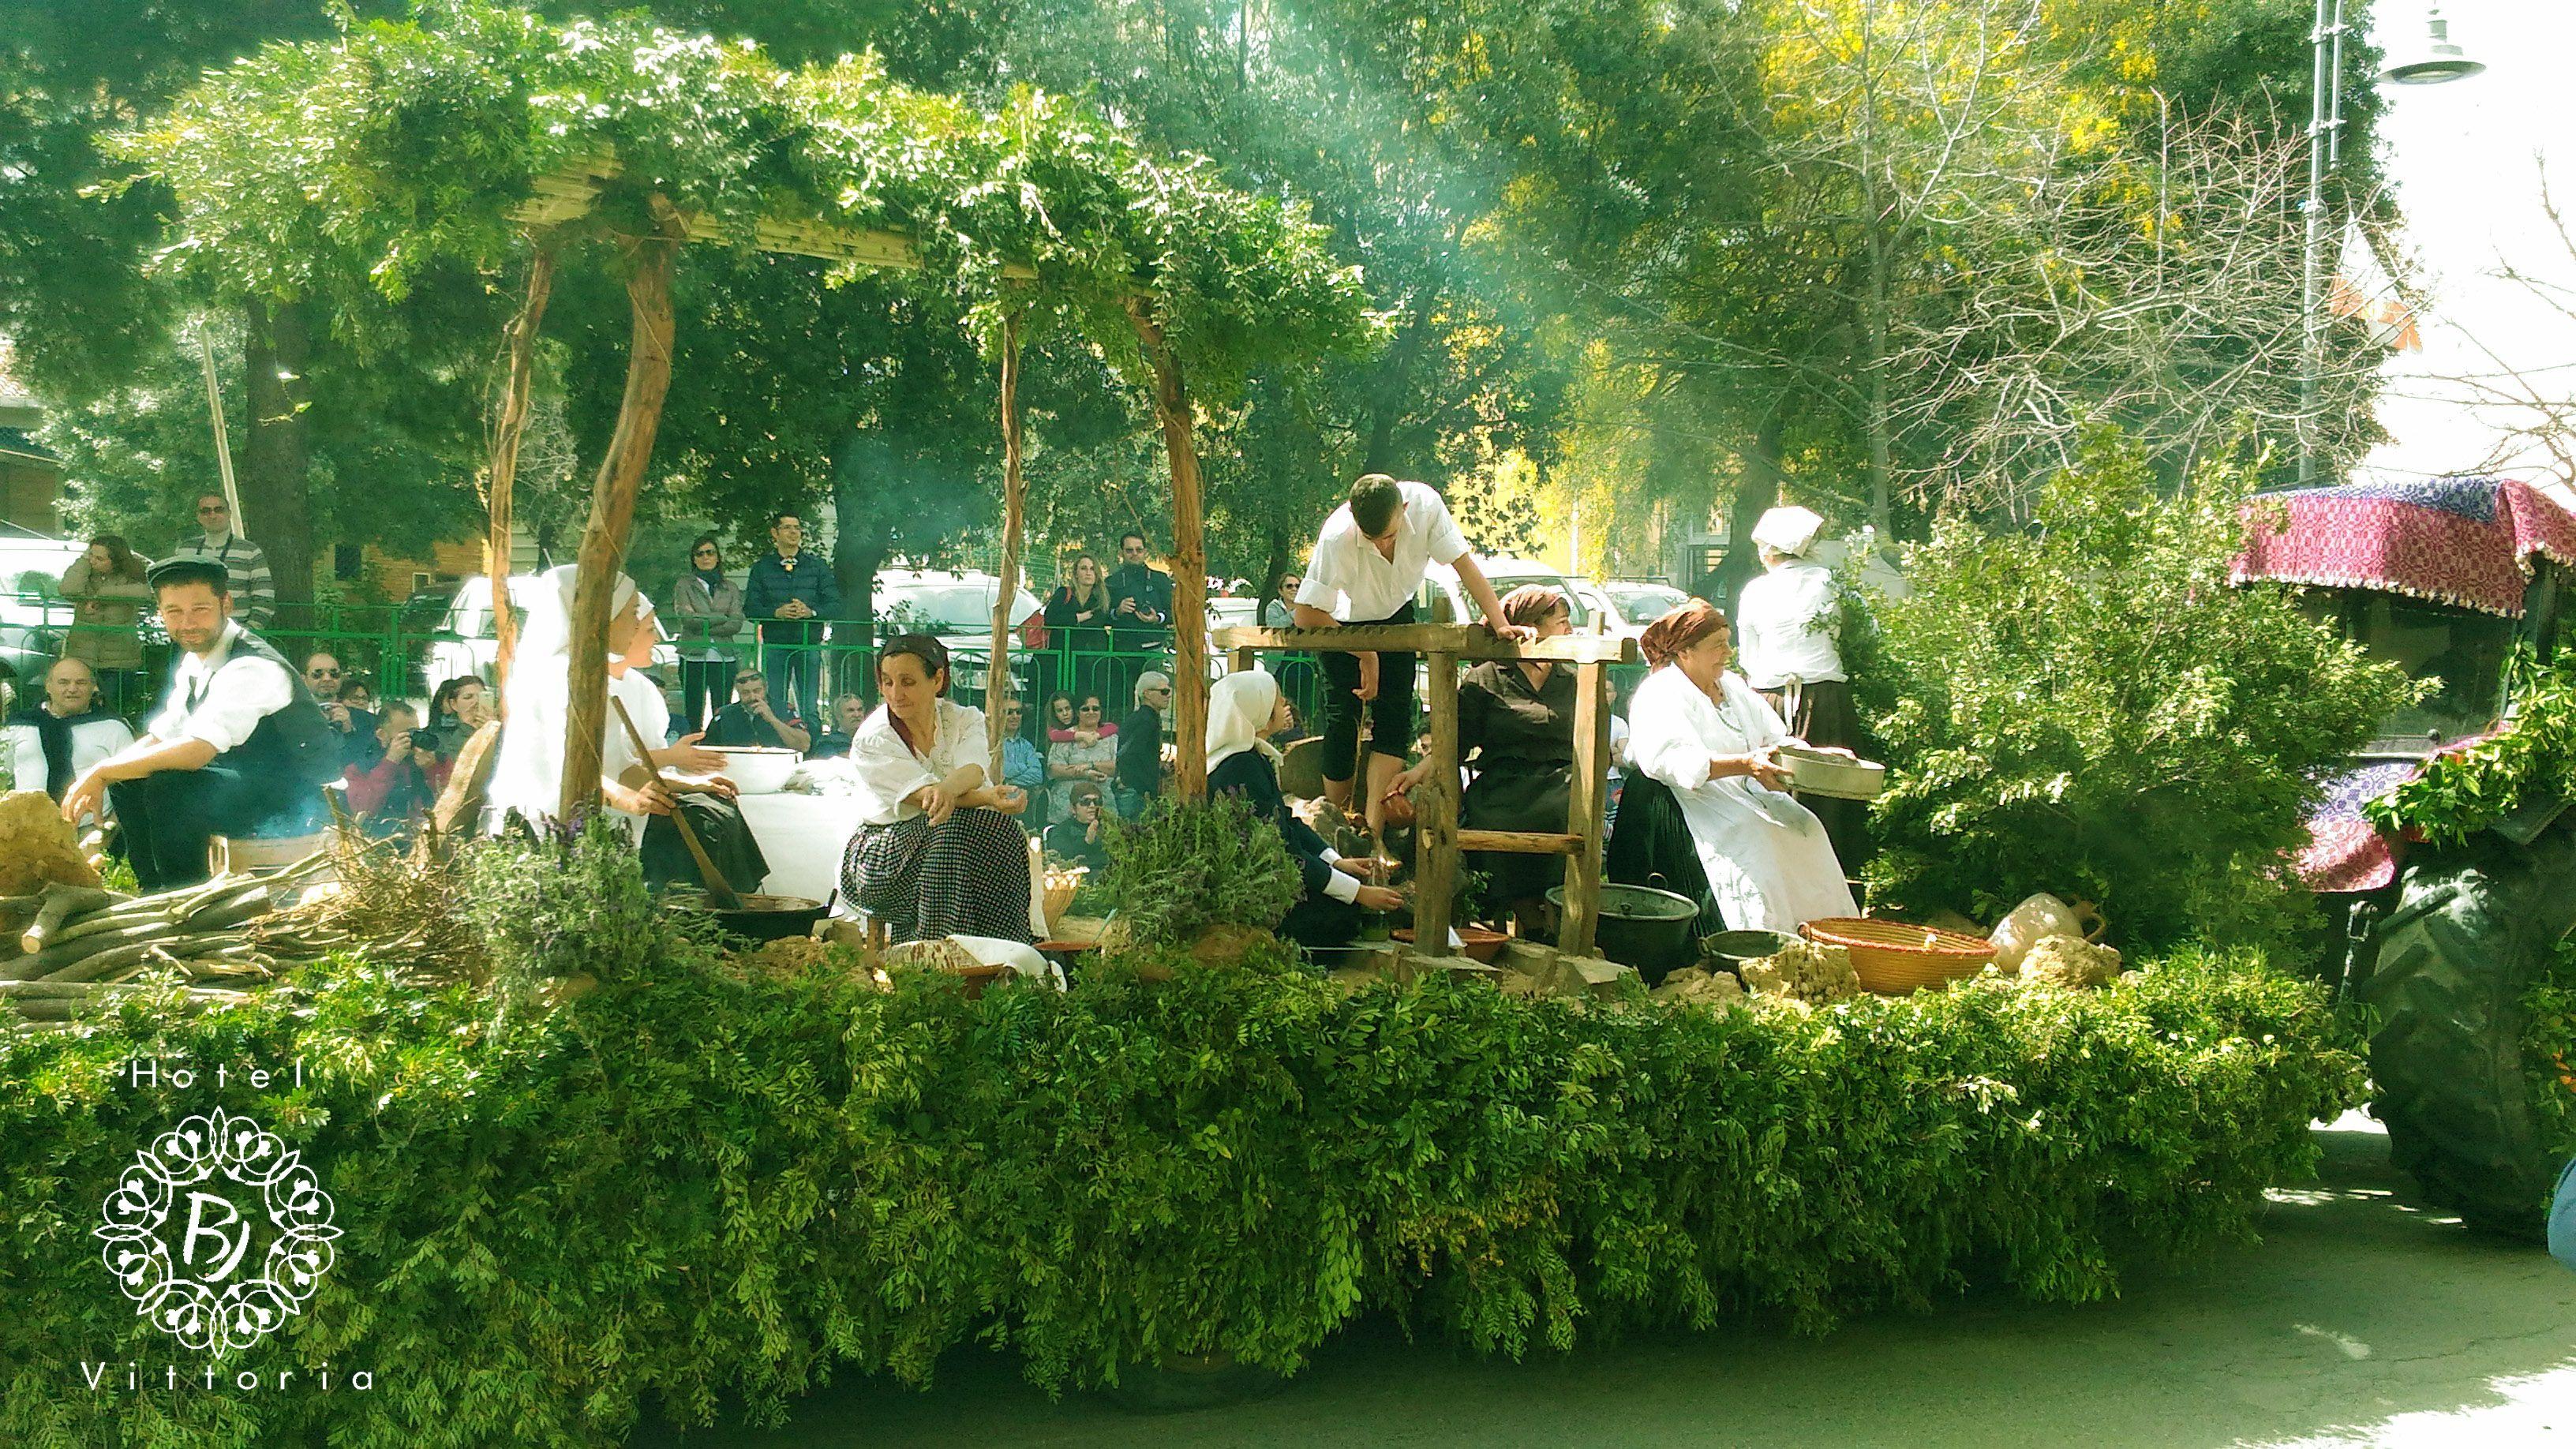 Sagra degli agrumi 2016 - Muravera - http://www.hotelbjvittoria.it/ #sagre #sagradegliagrumi2016 #Muravera